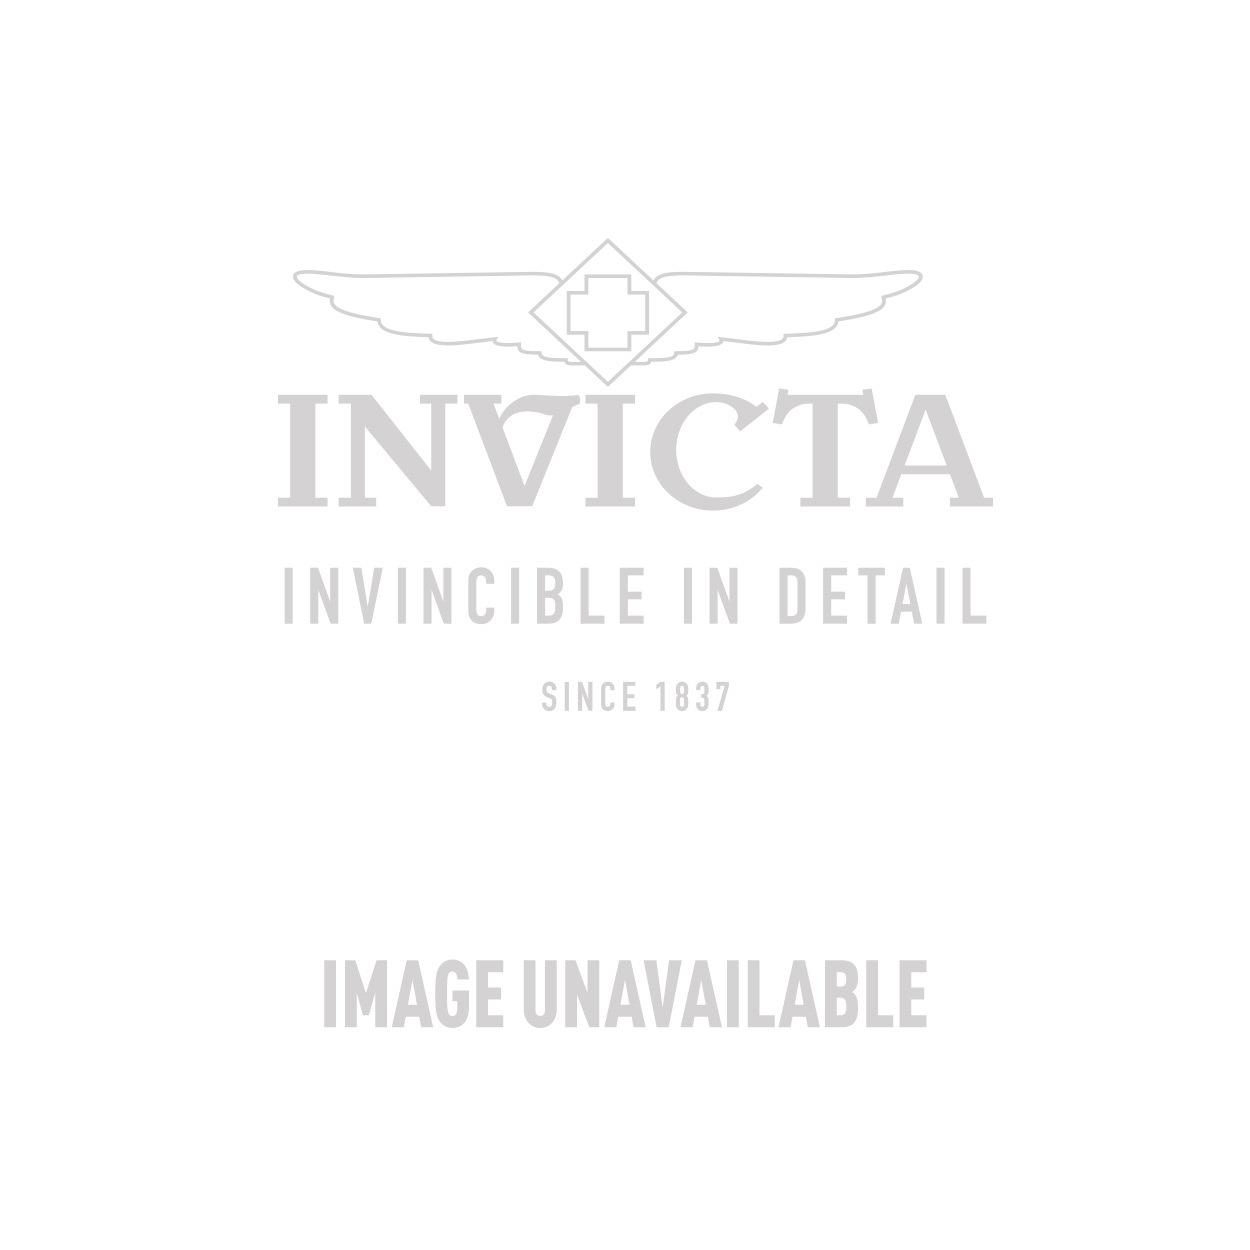 12d9f369c Invicta Akula watch in Rose Gold, Black at InvictaStores.com